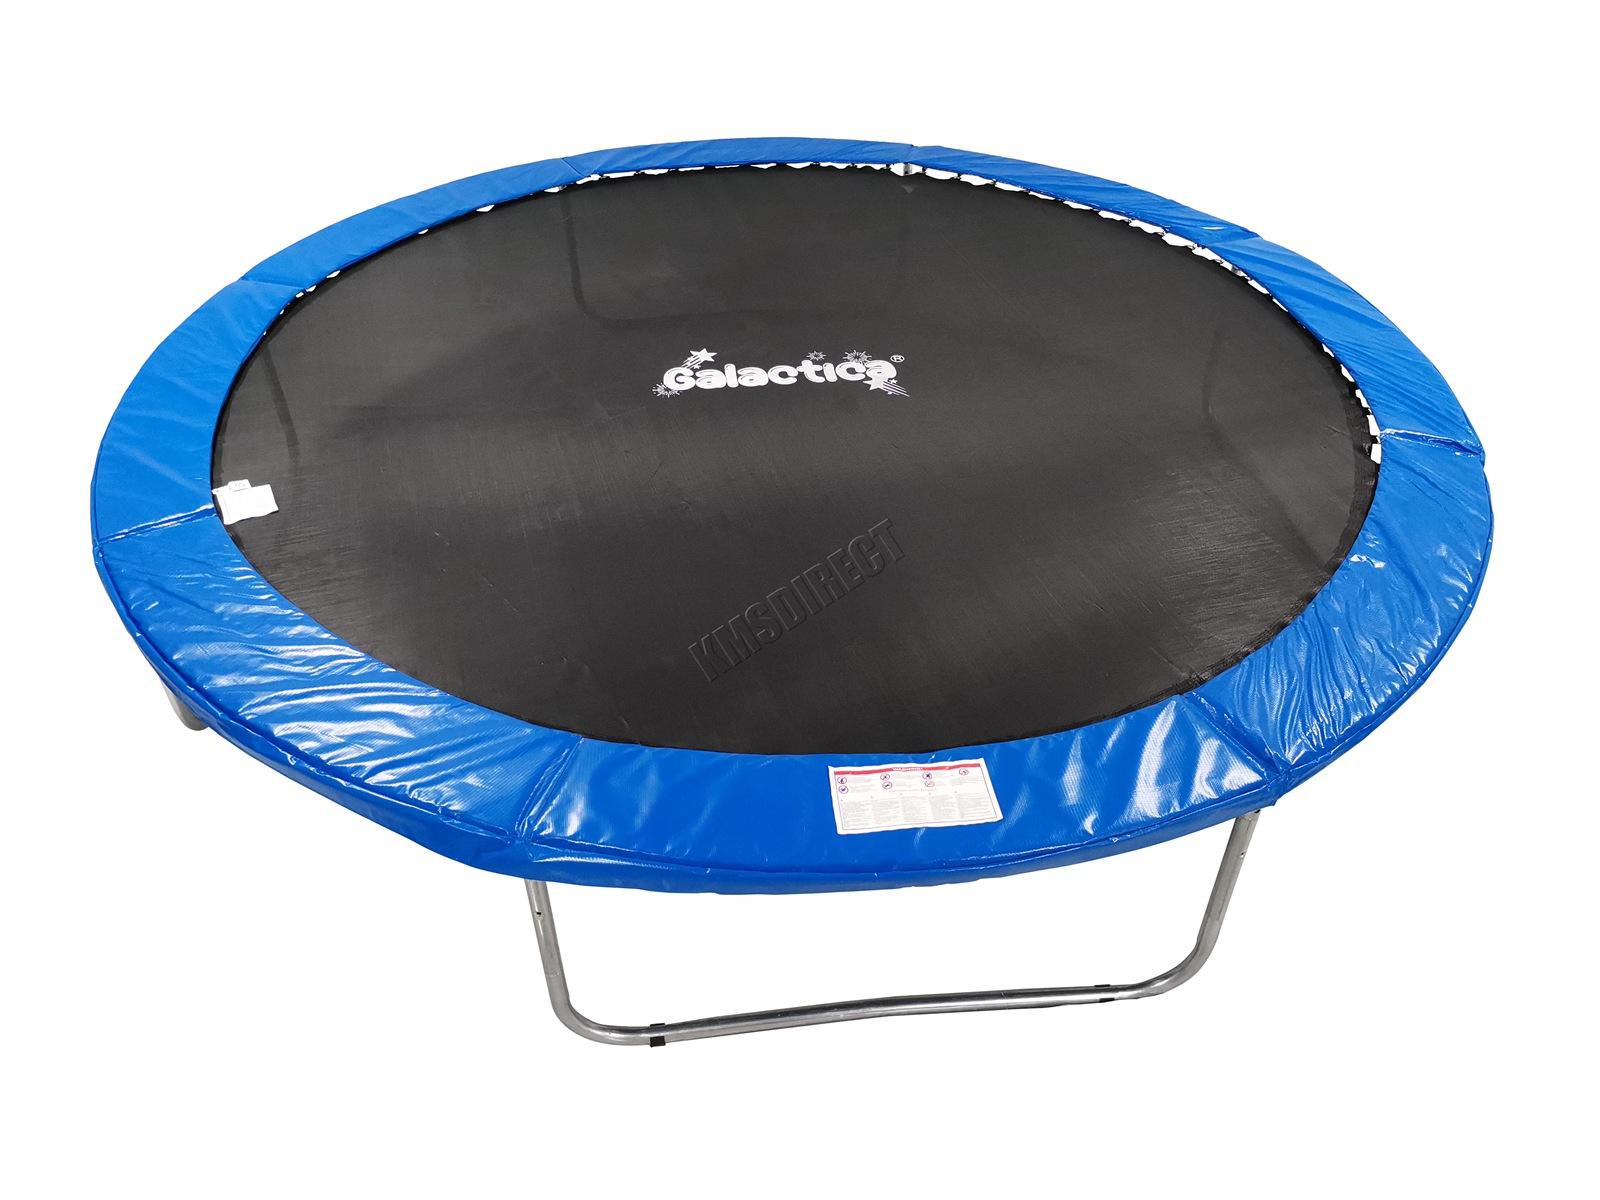 GALACTICA Trampoline Set 8 10 12 14FT Round Outdoor Garden Safety Net Enclosure Spring Jump Mat Rain Cover Padding Ladder Shoe Bag Blue